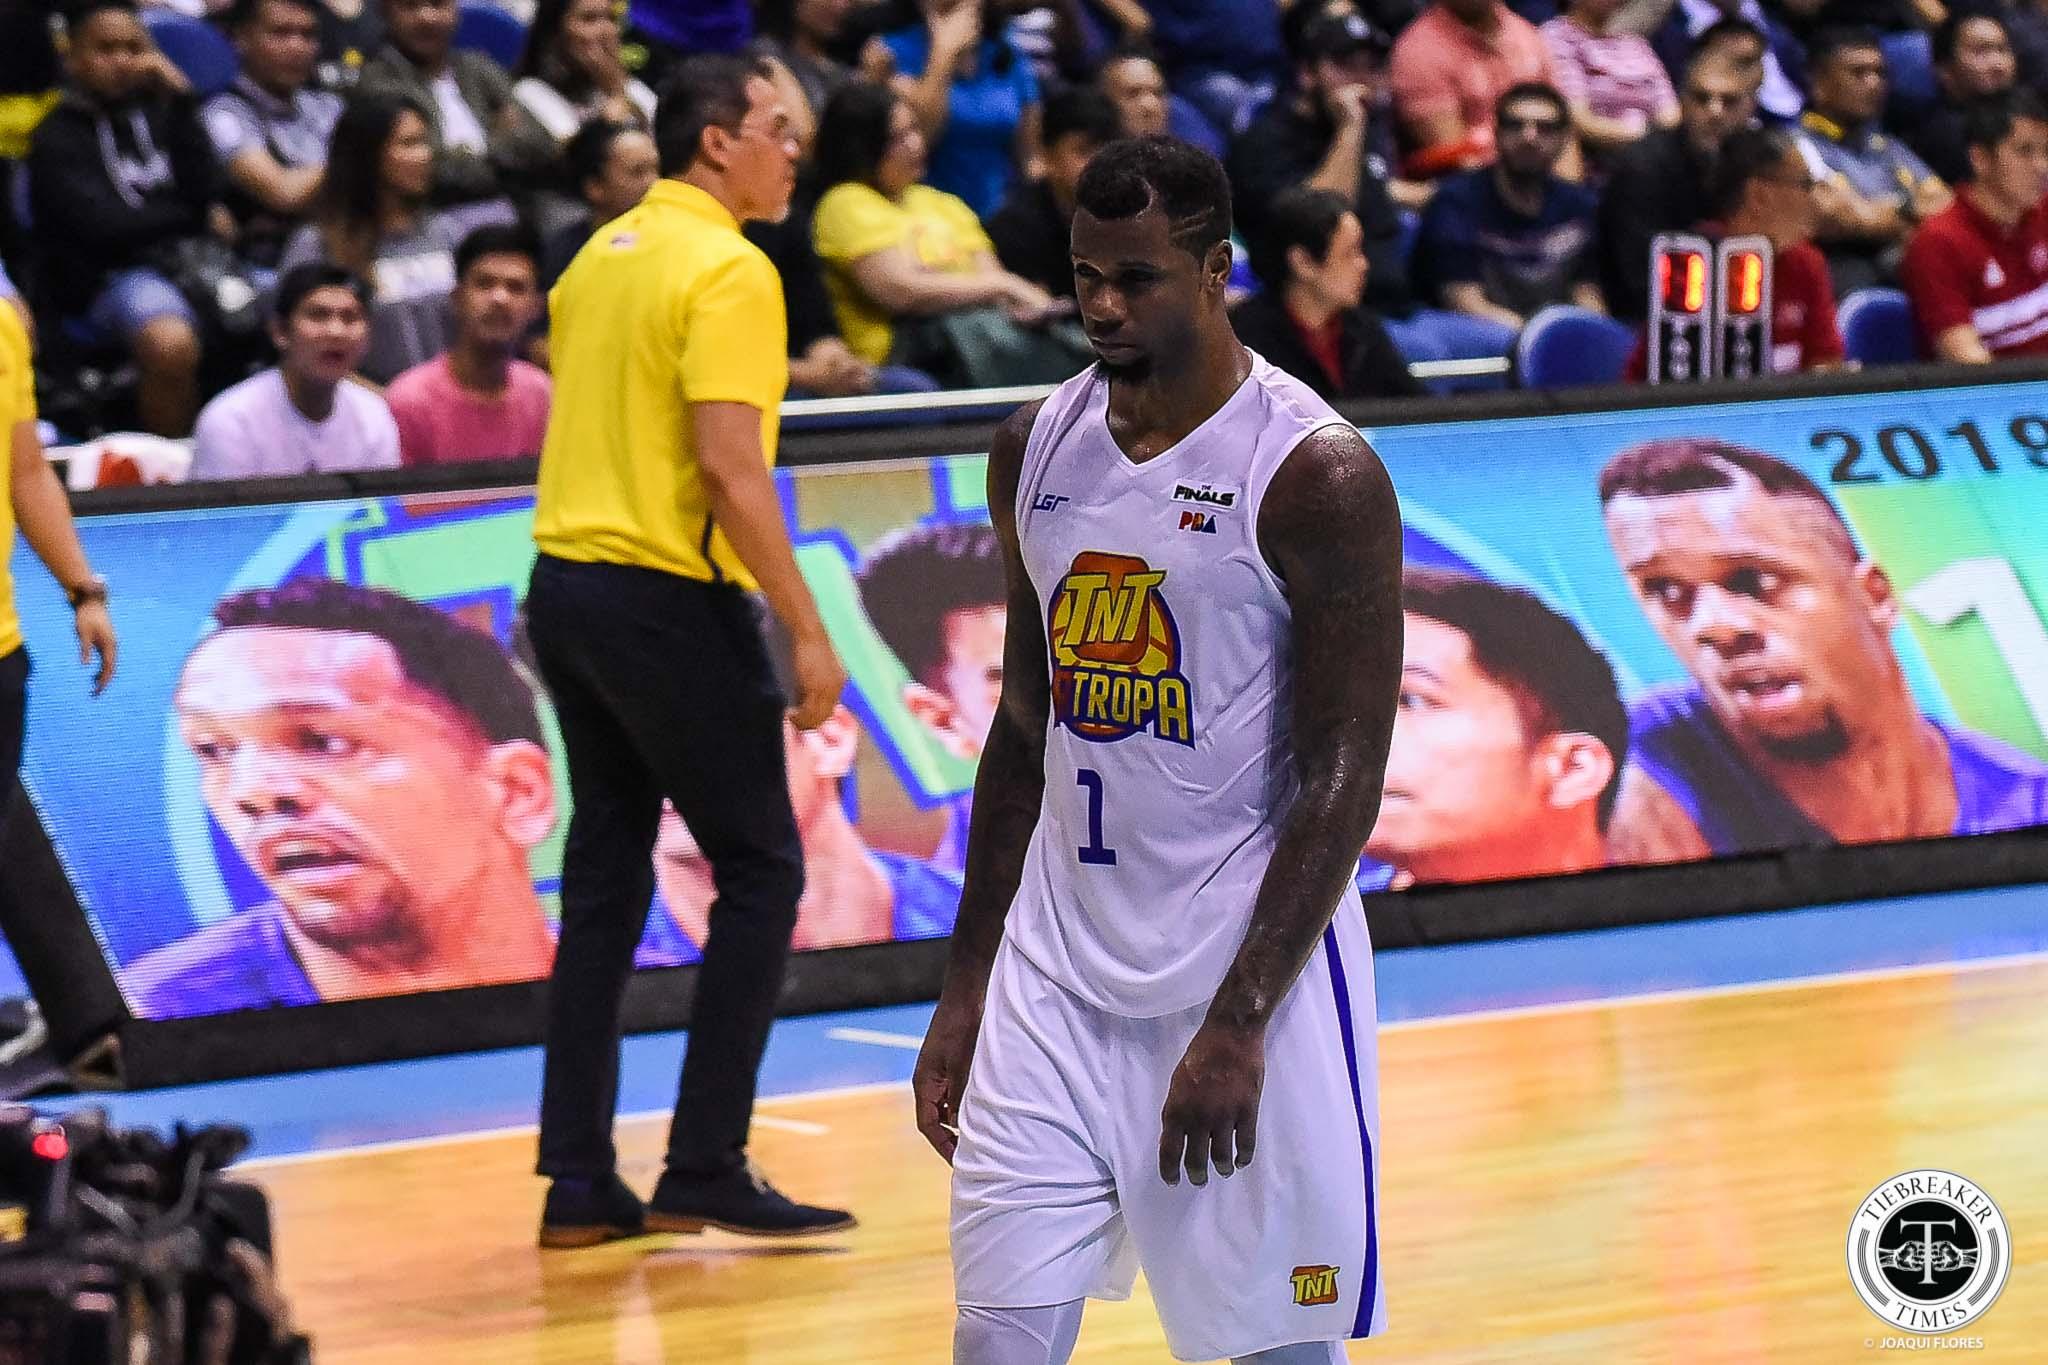 Tiebreaker Times Terrence Jones accepts Arwind Santos' apology Basketball News PBA  TNT Katropa Terrence Jones PBA Season 44 2019 PBA Commissioners Cup